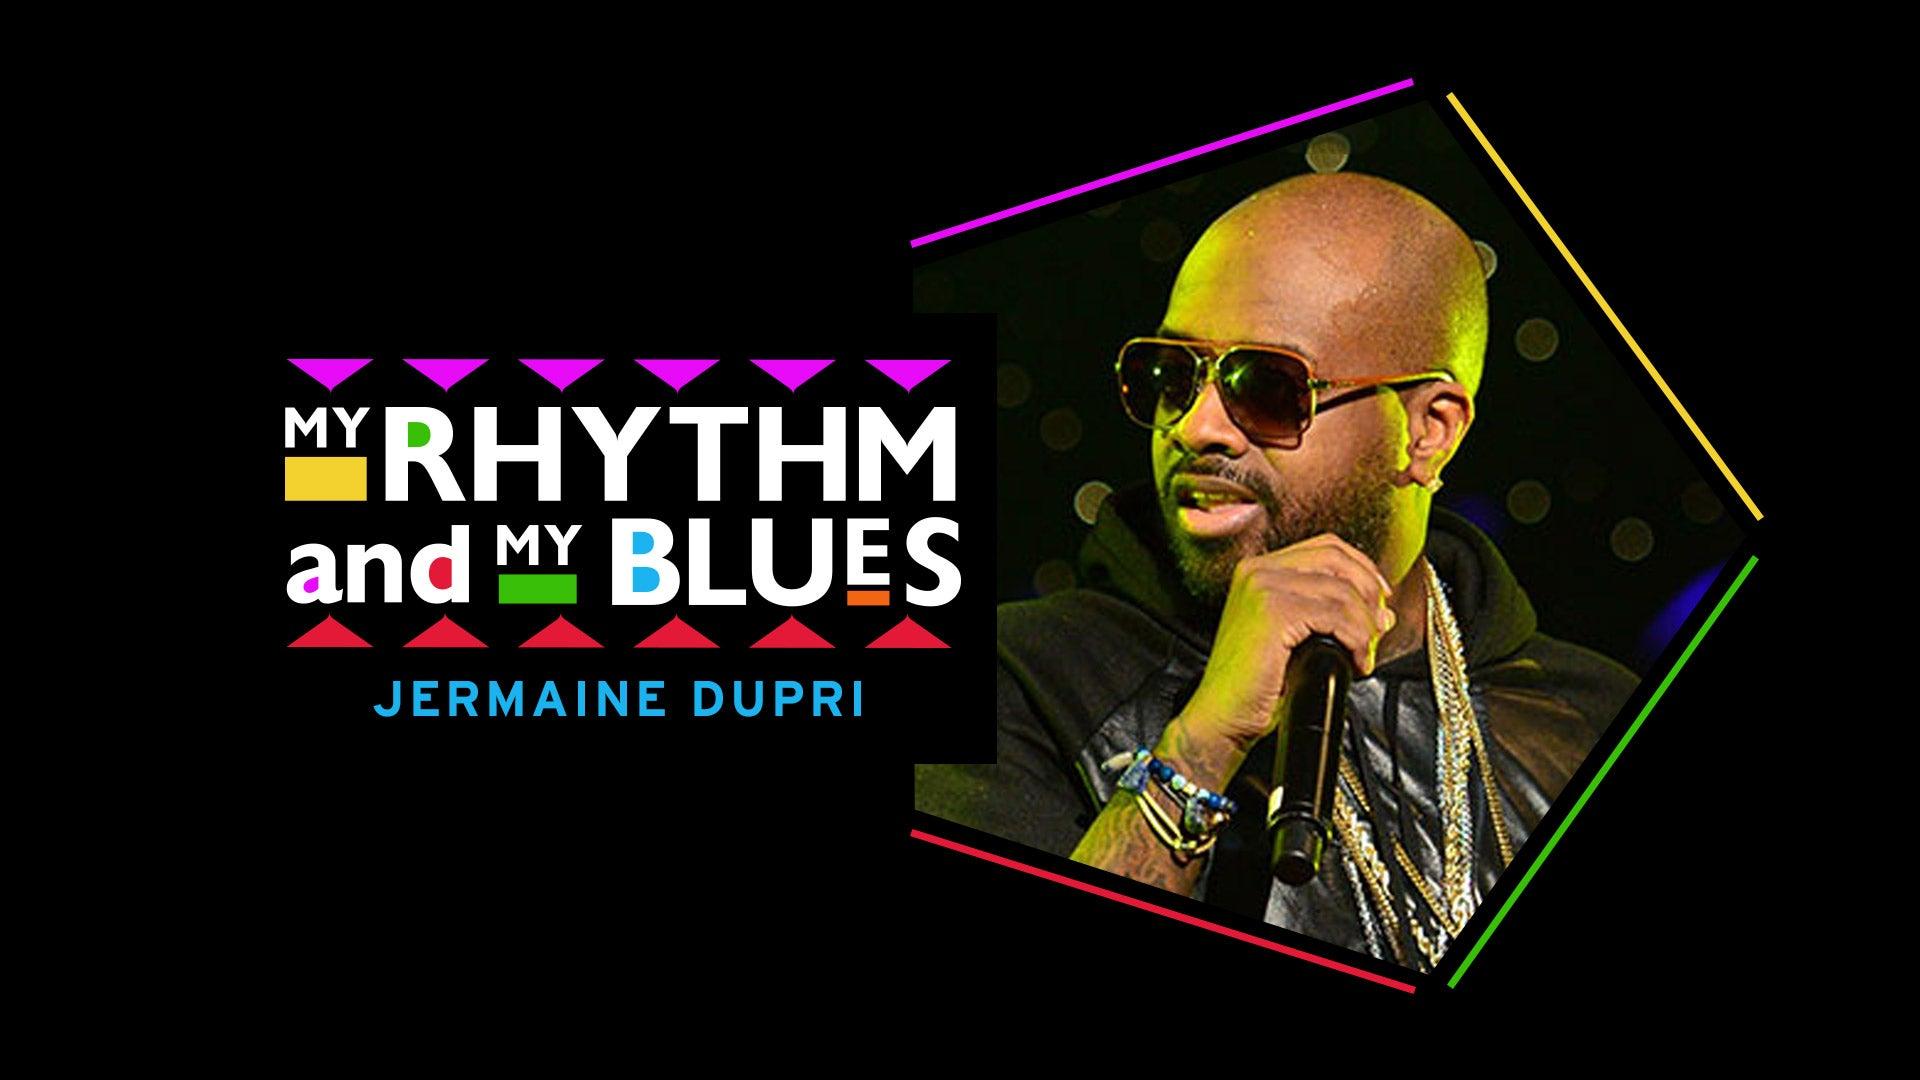 My Rhythm and My Blues: Jermaine Dupri